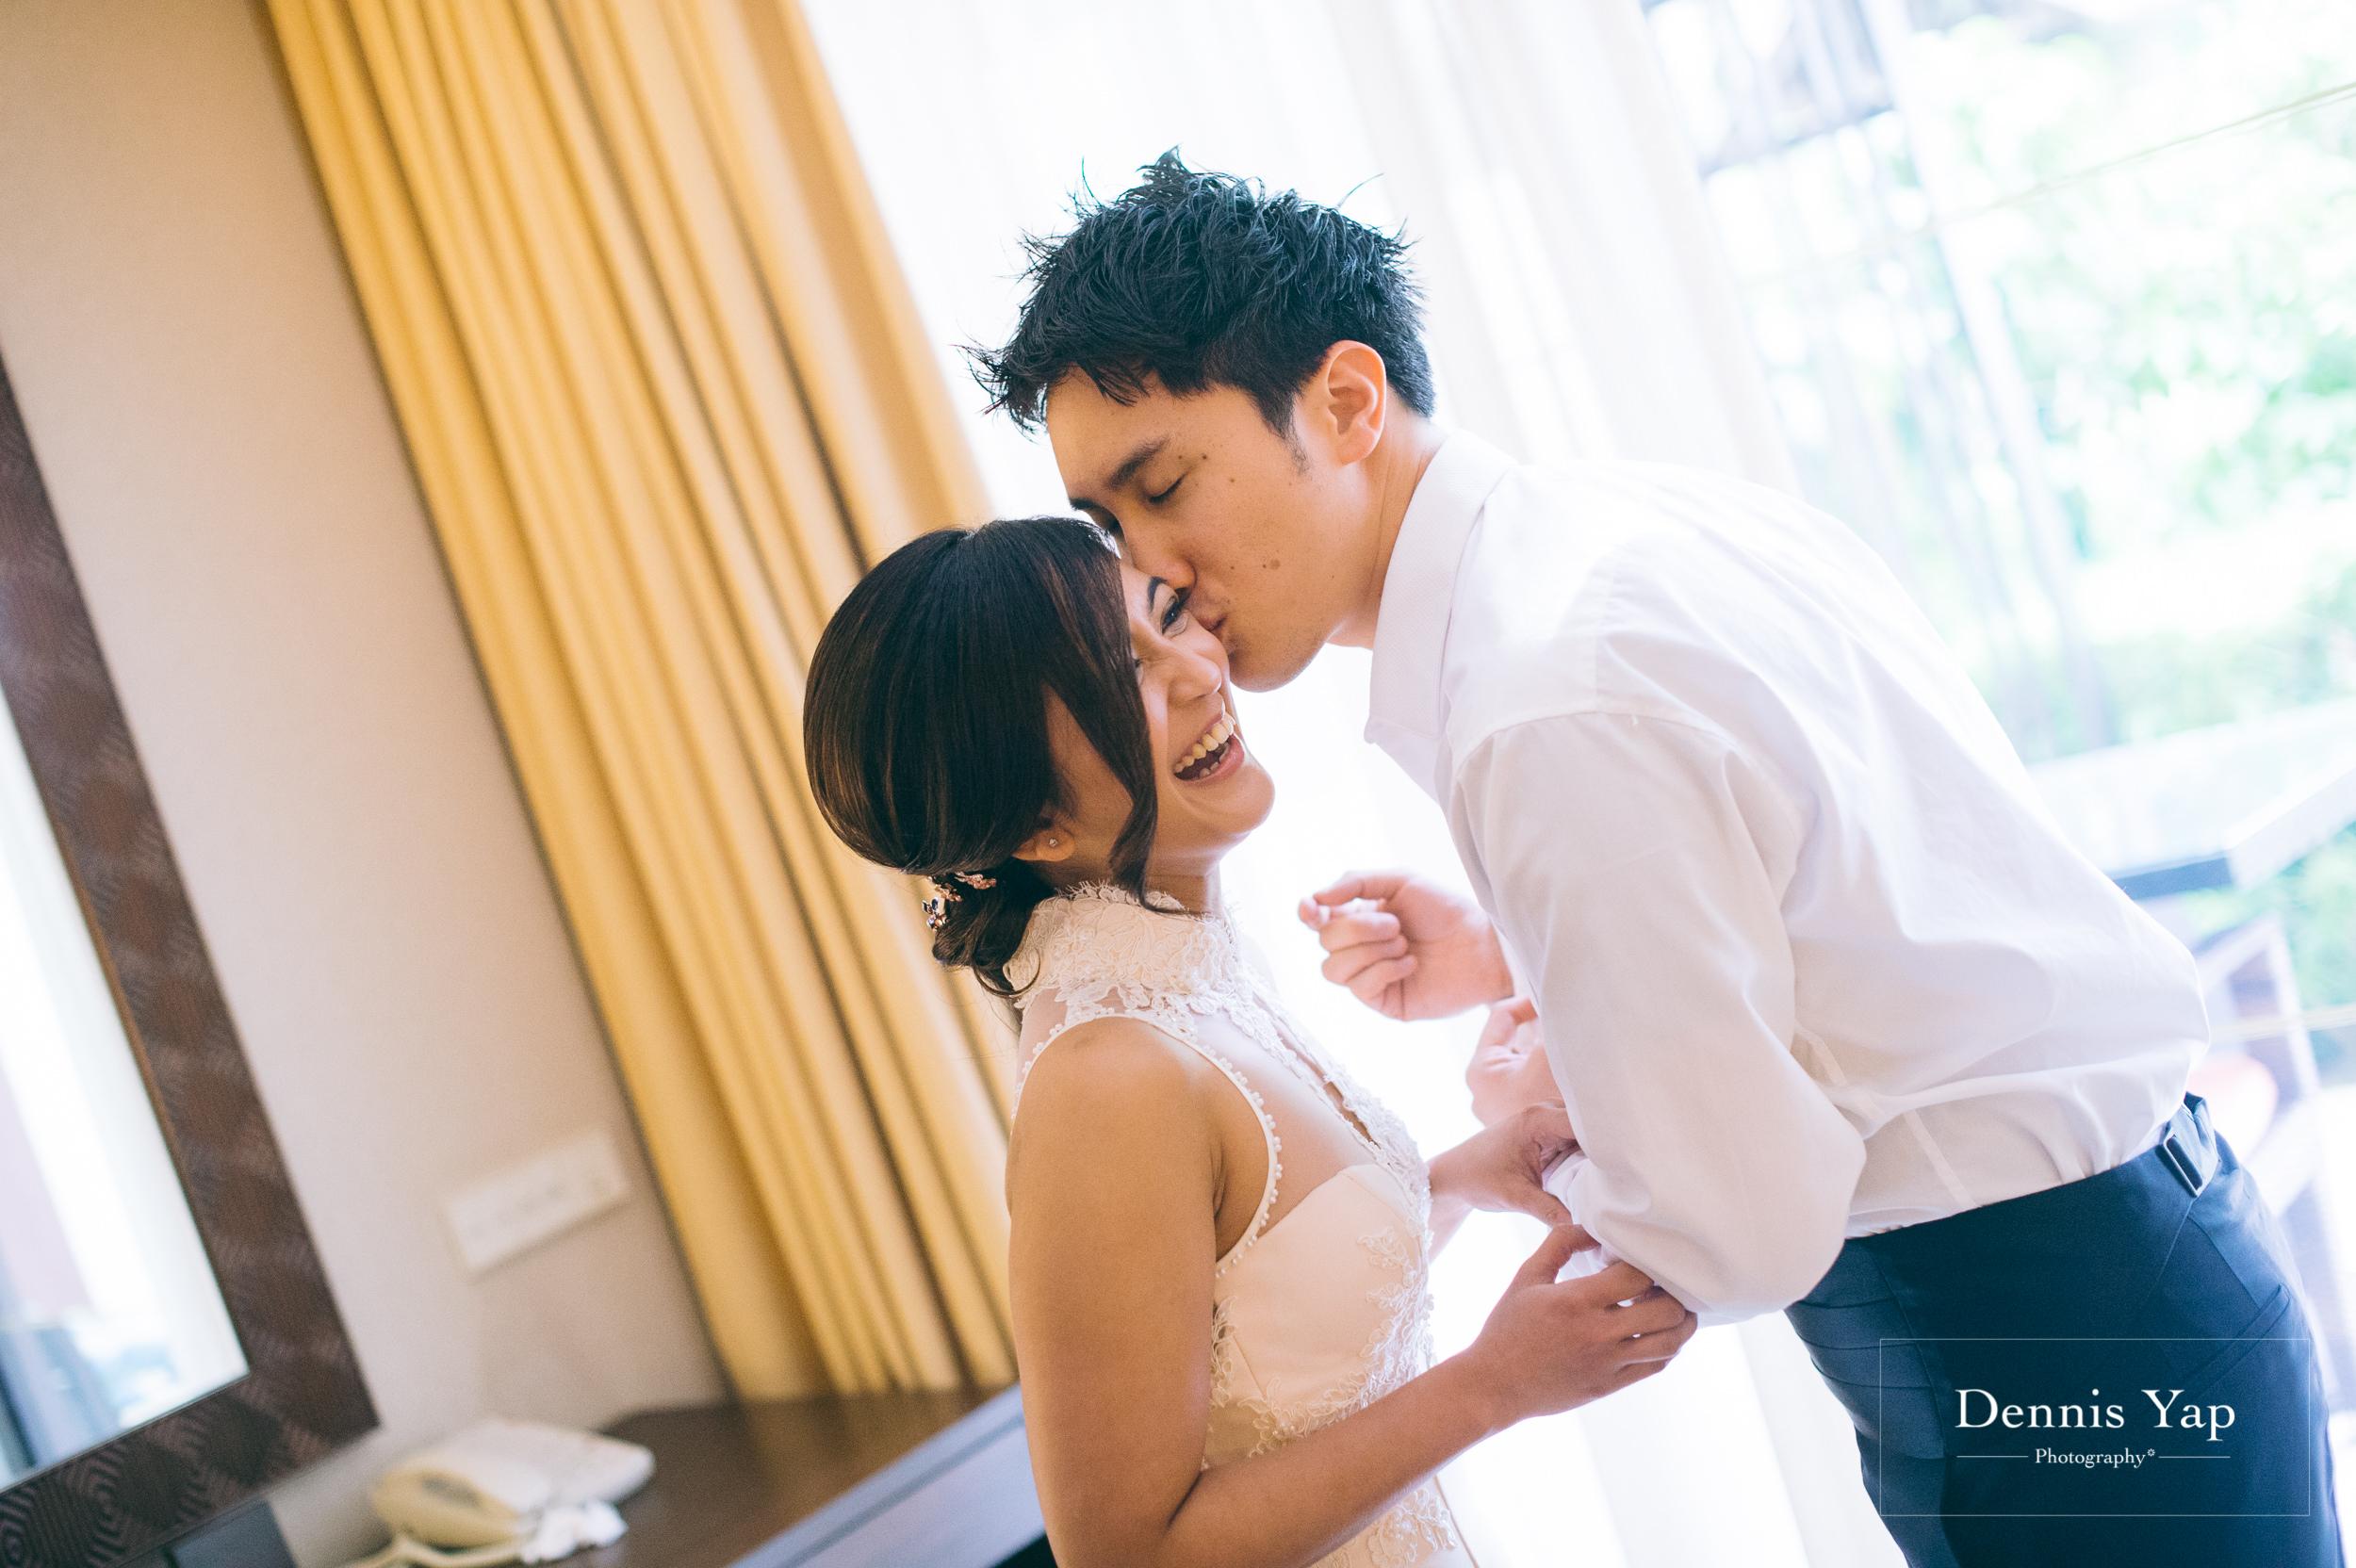 shalini yelitte wedding dinner rasa sayang resort penang dennis yap photography malaysia top wedding photographer beloved emotions flow -10.jpg